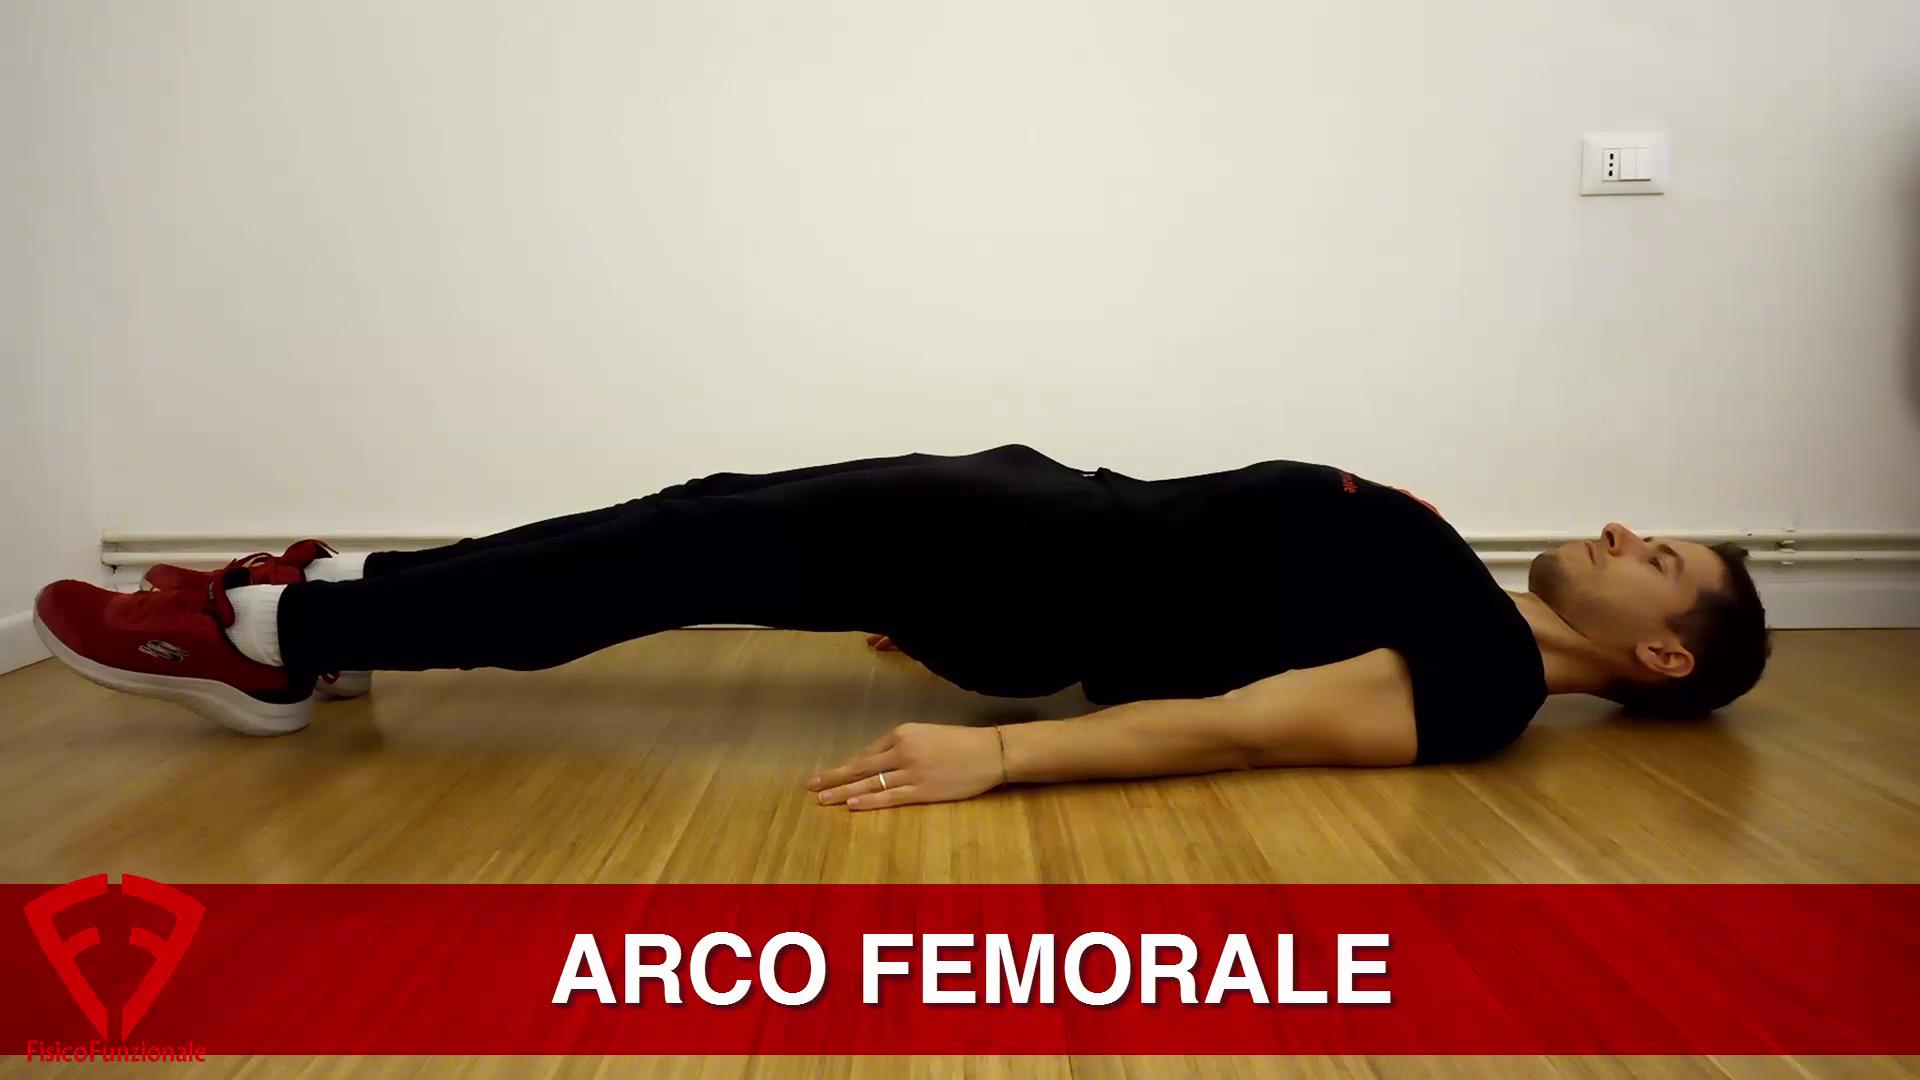 arco femorale